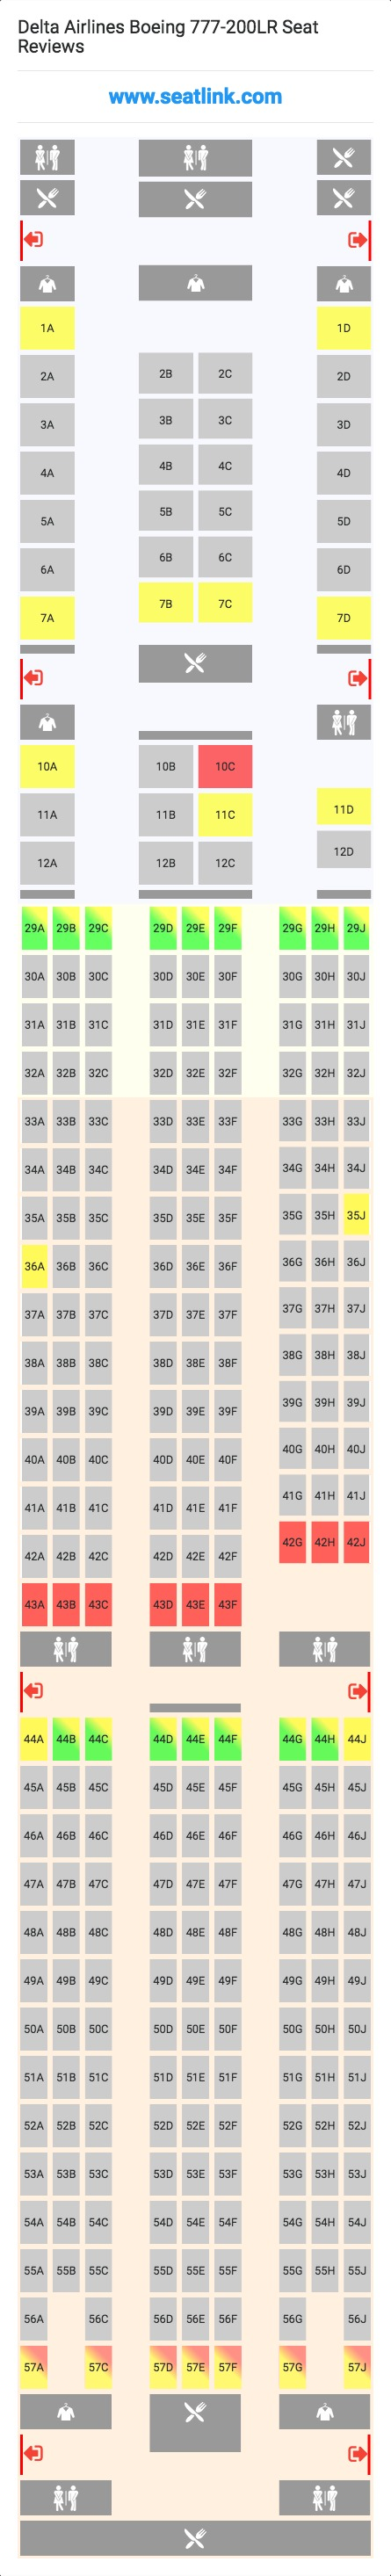 delta flight seating chart. Black Bedroom Furniture Sets. Home Design Ideas